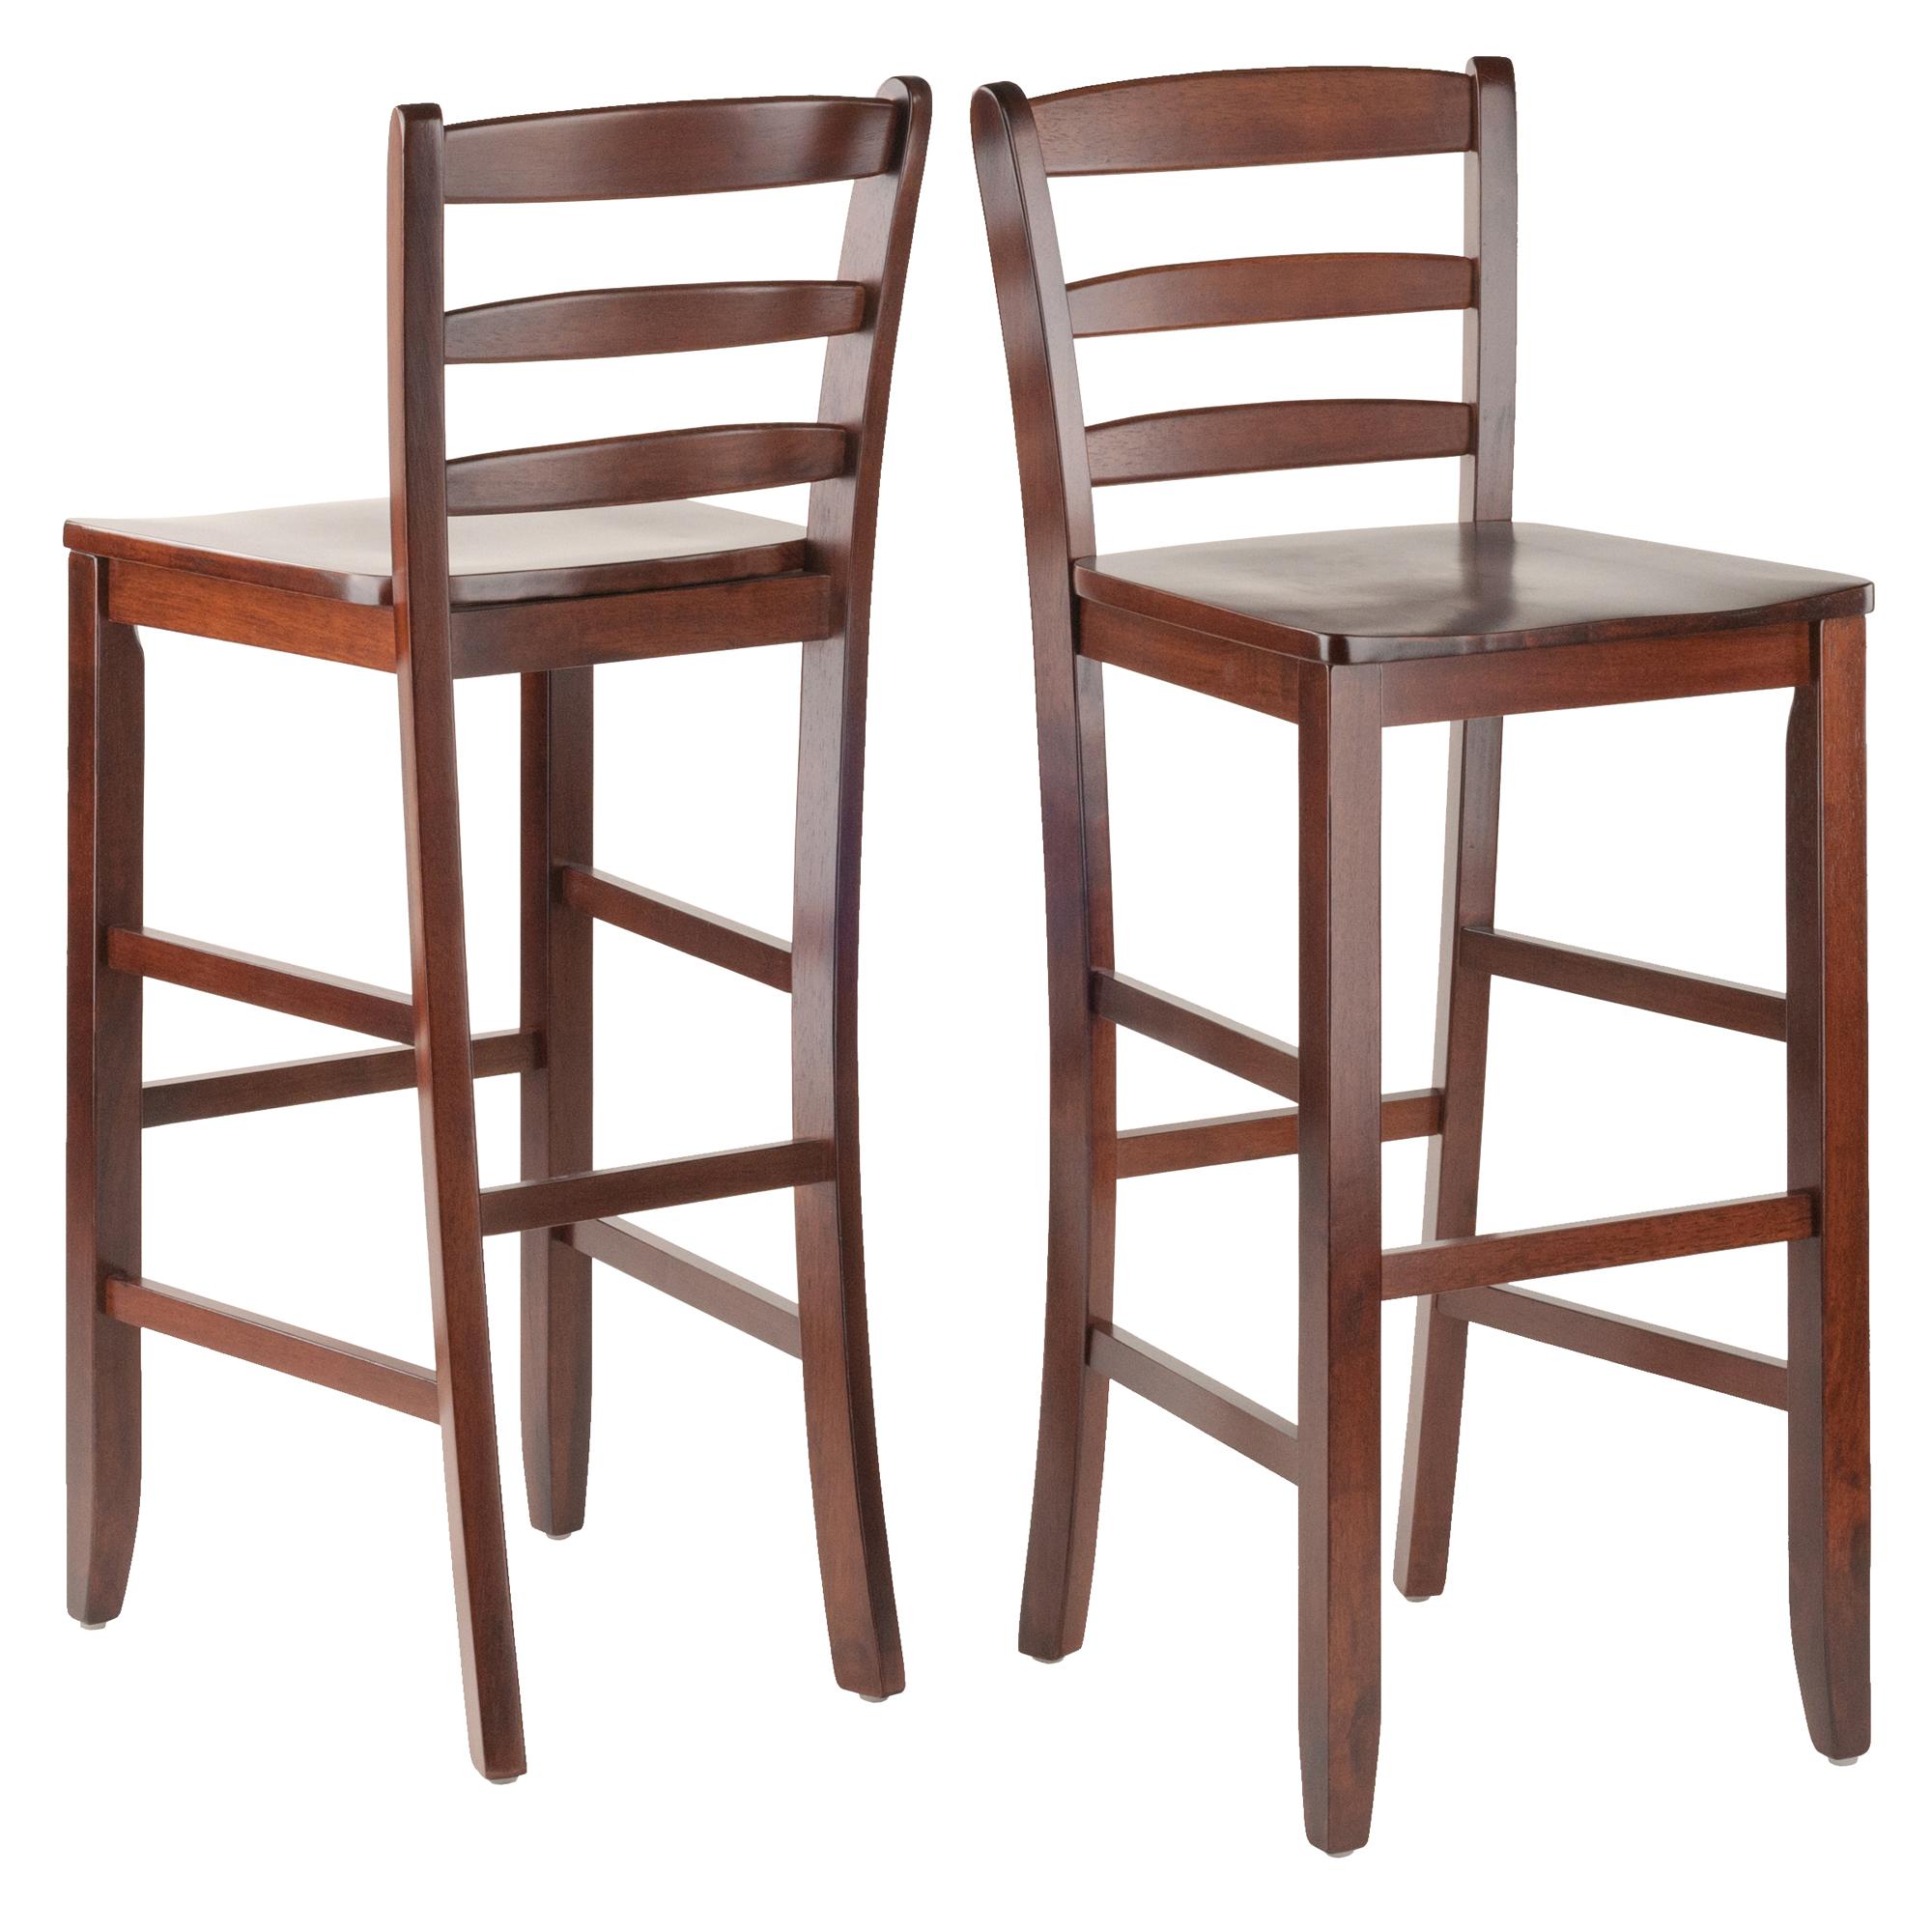 Winsome Wood Benjamin Ladder-Back Bar Stools, Set of 2, Walnut Finish